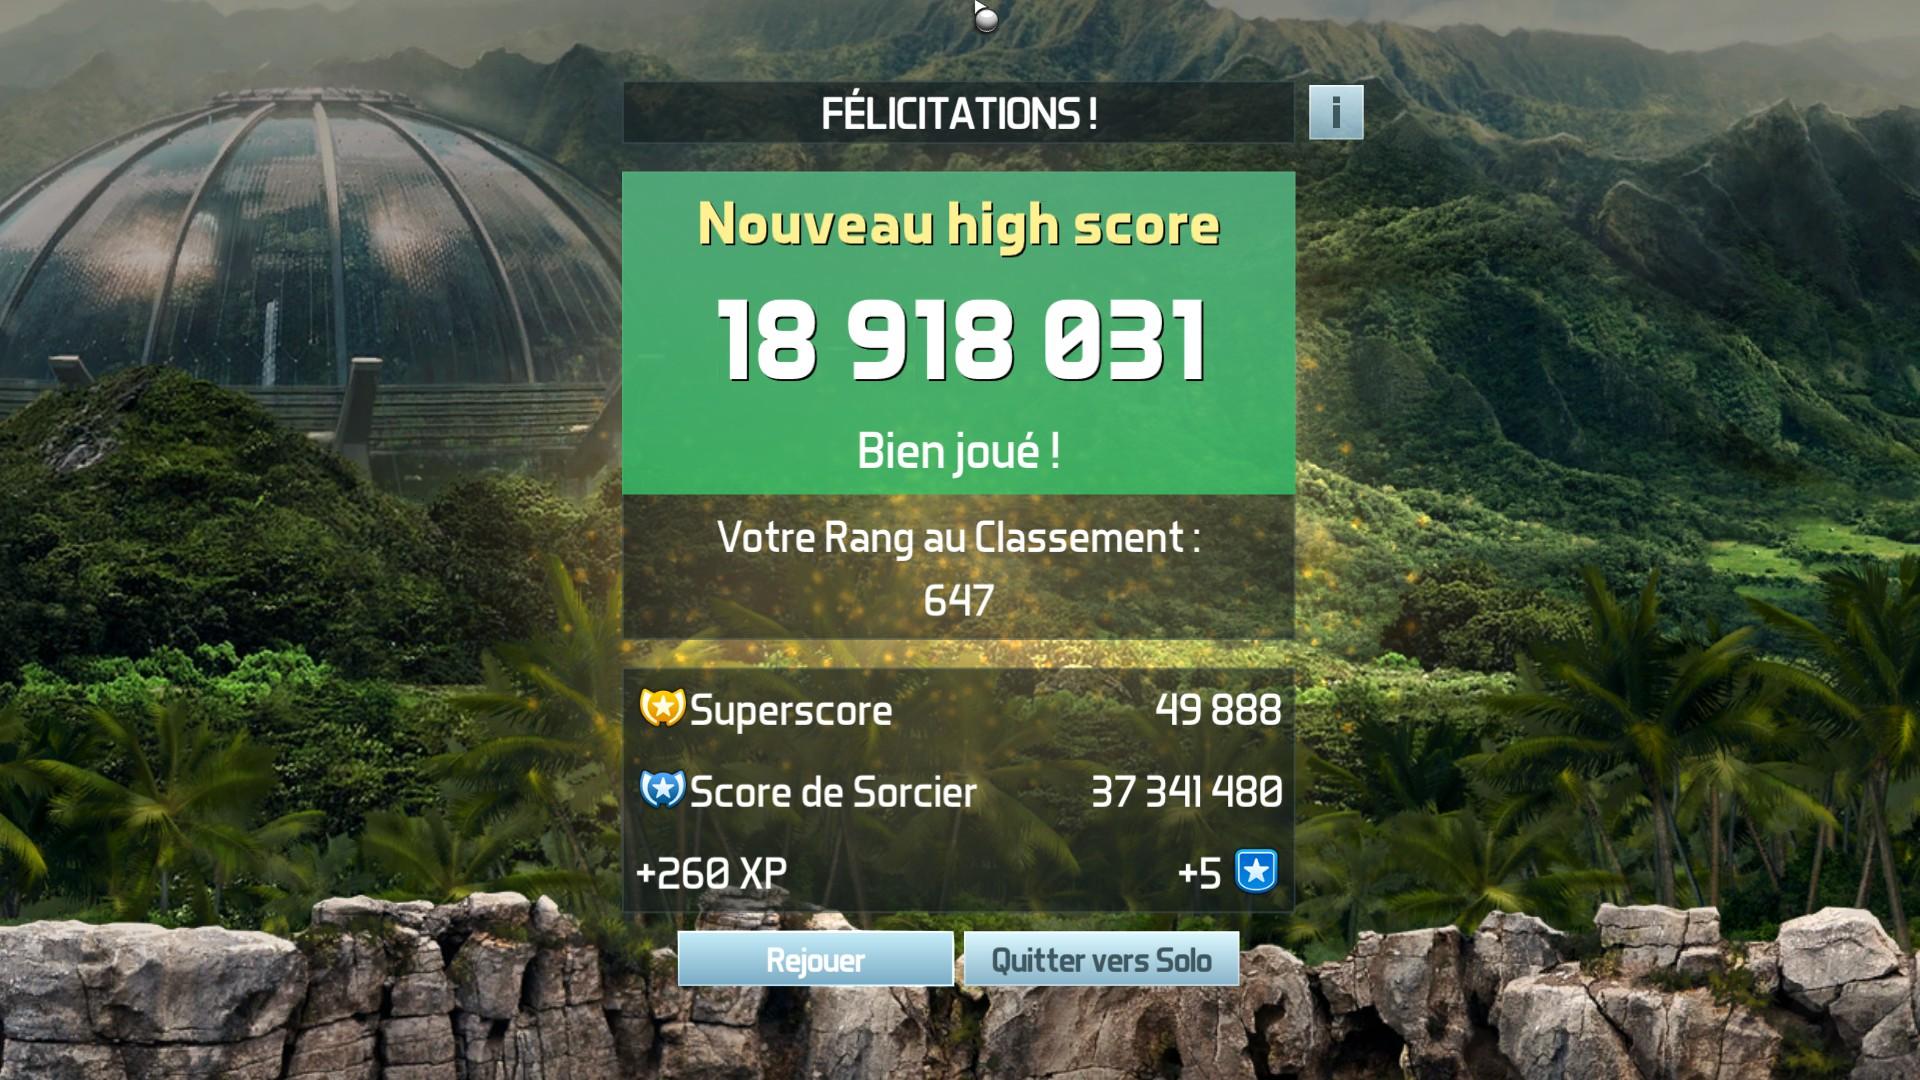 Mantalow: Pinball FX3: Jurassic World Pinball (PC) 18,918,031 points on 2018-05-10 03:27:52